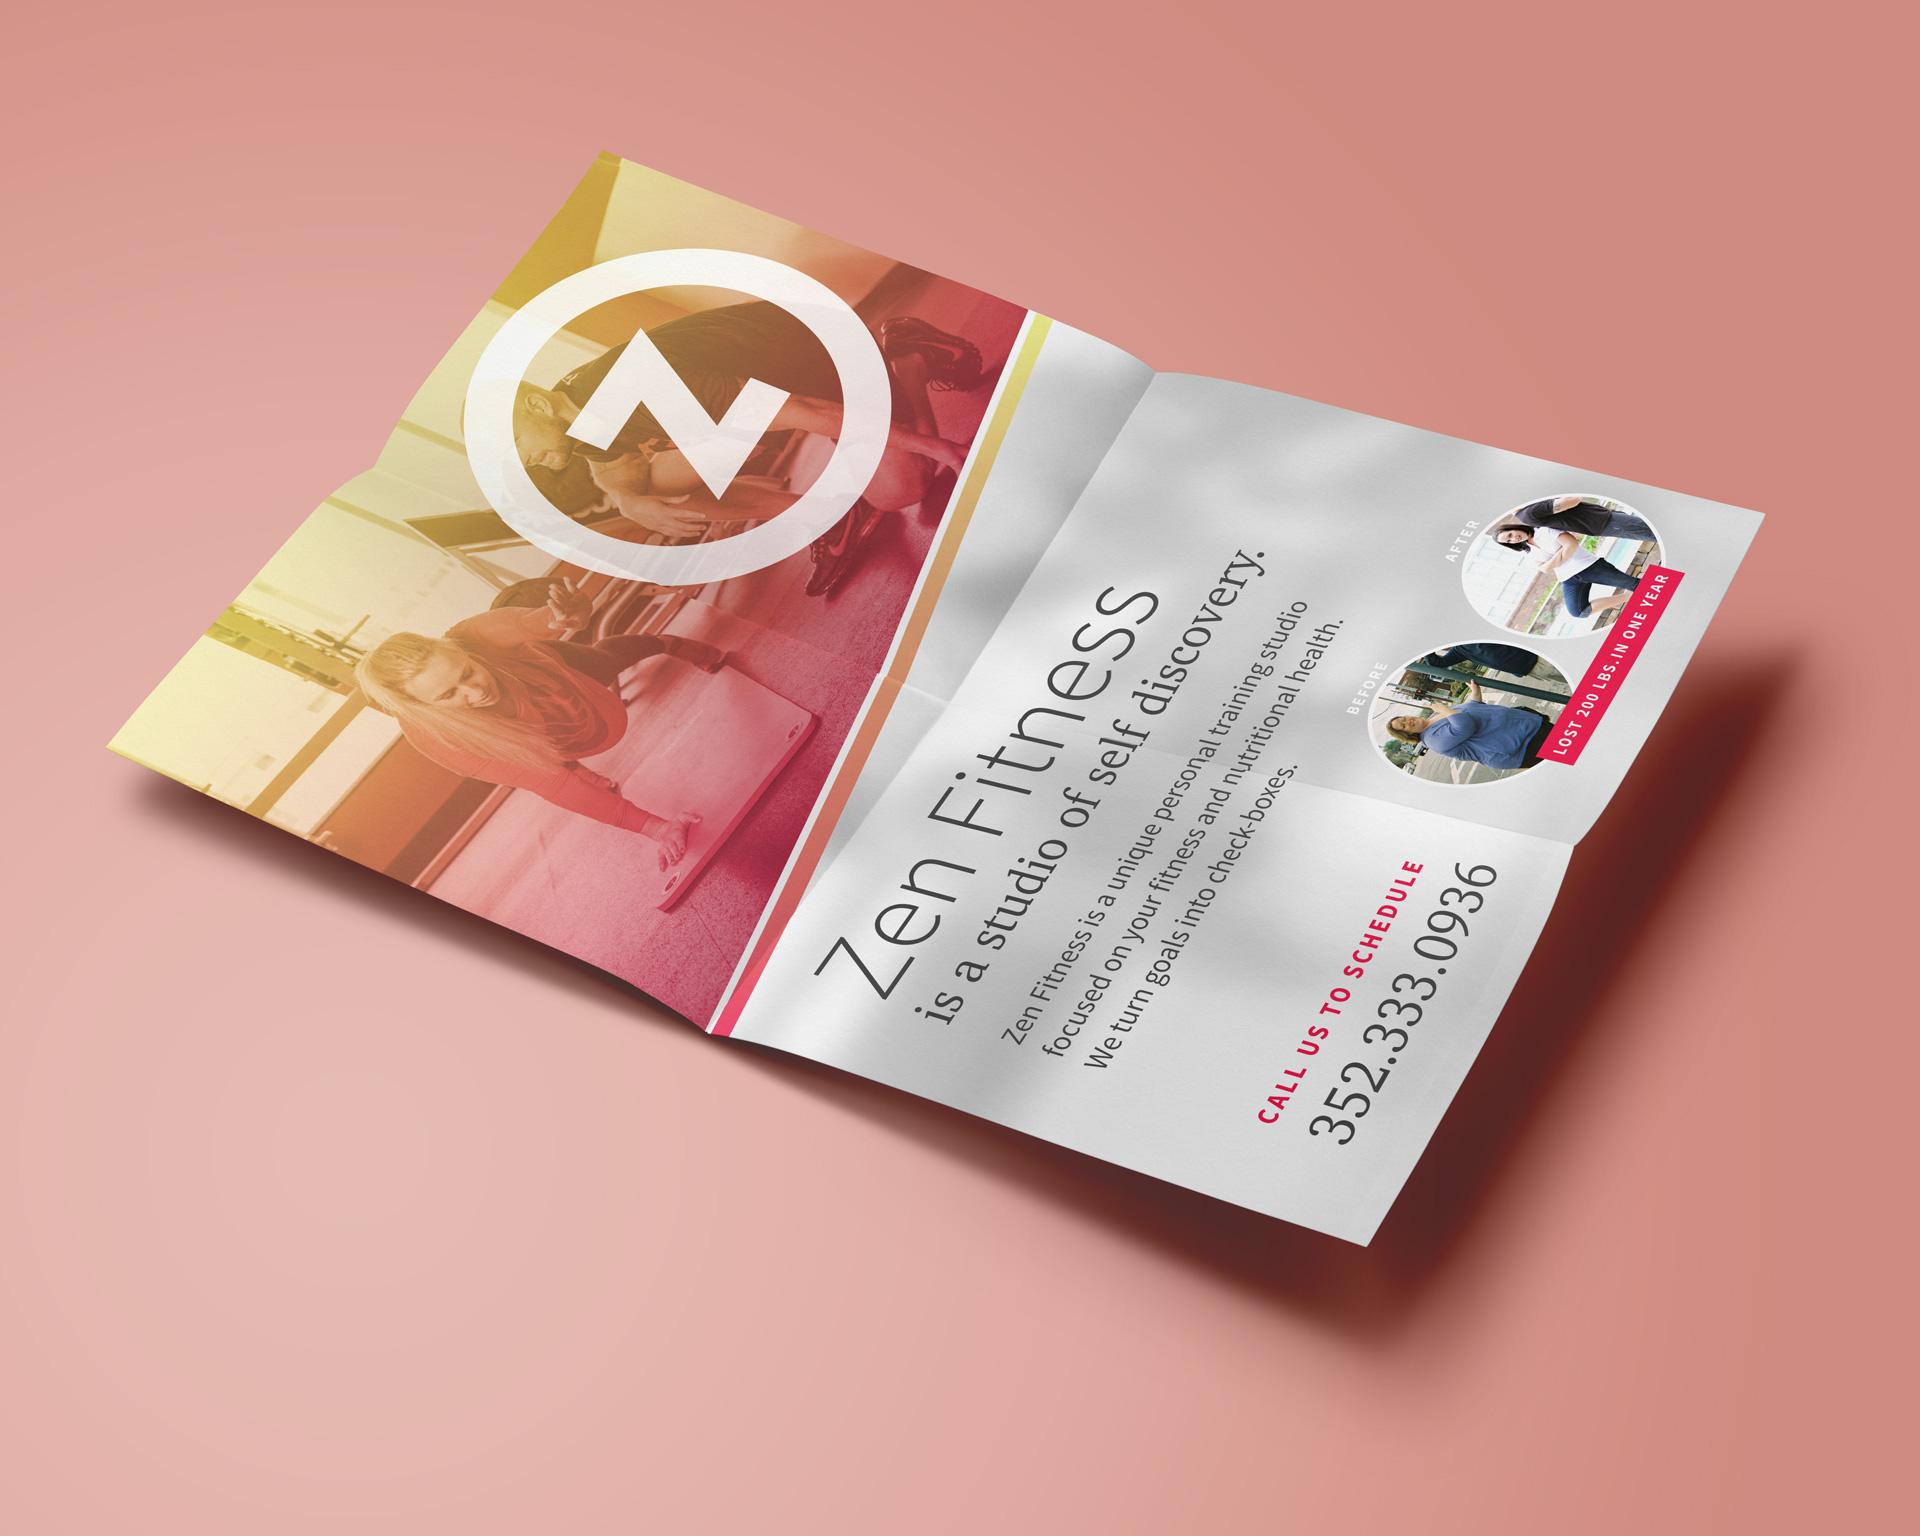 patrick-sanders-portfolio-graphic-design-zen-fitness-folded-poster.jpg